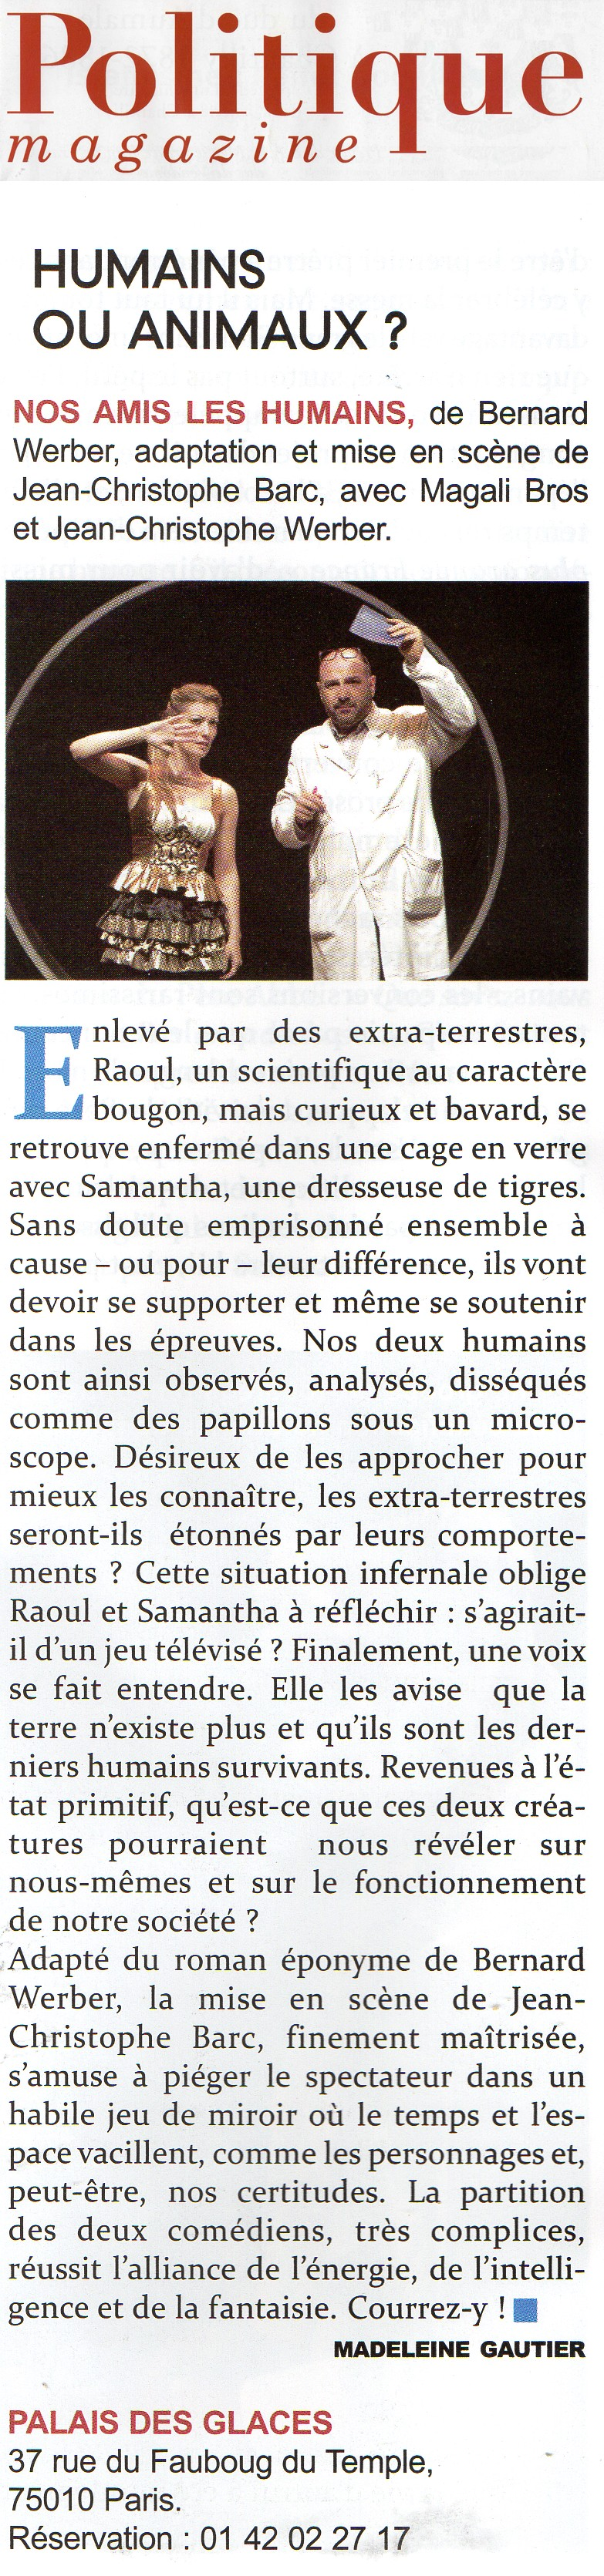 PolitiqueMag_30112016